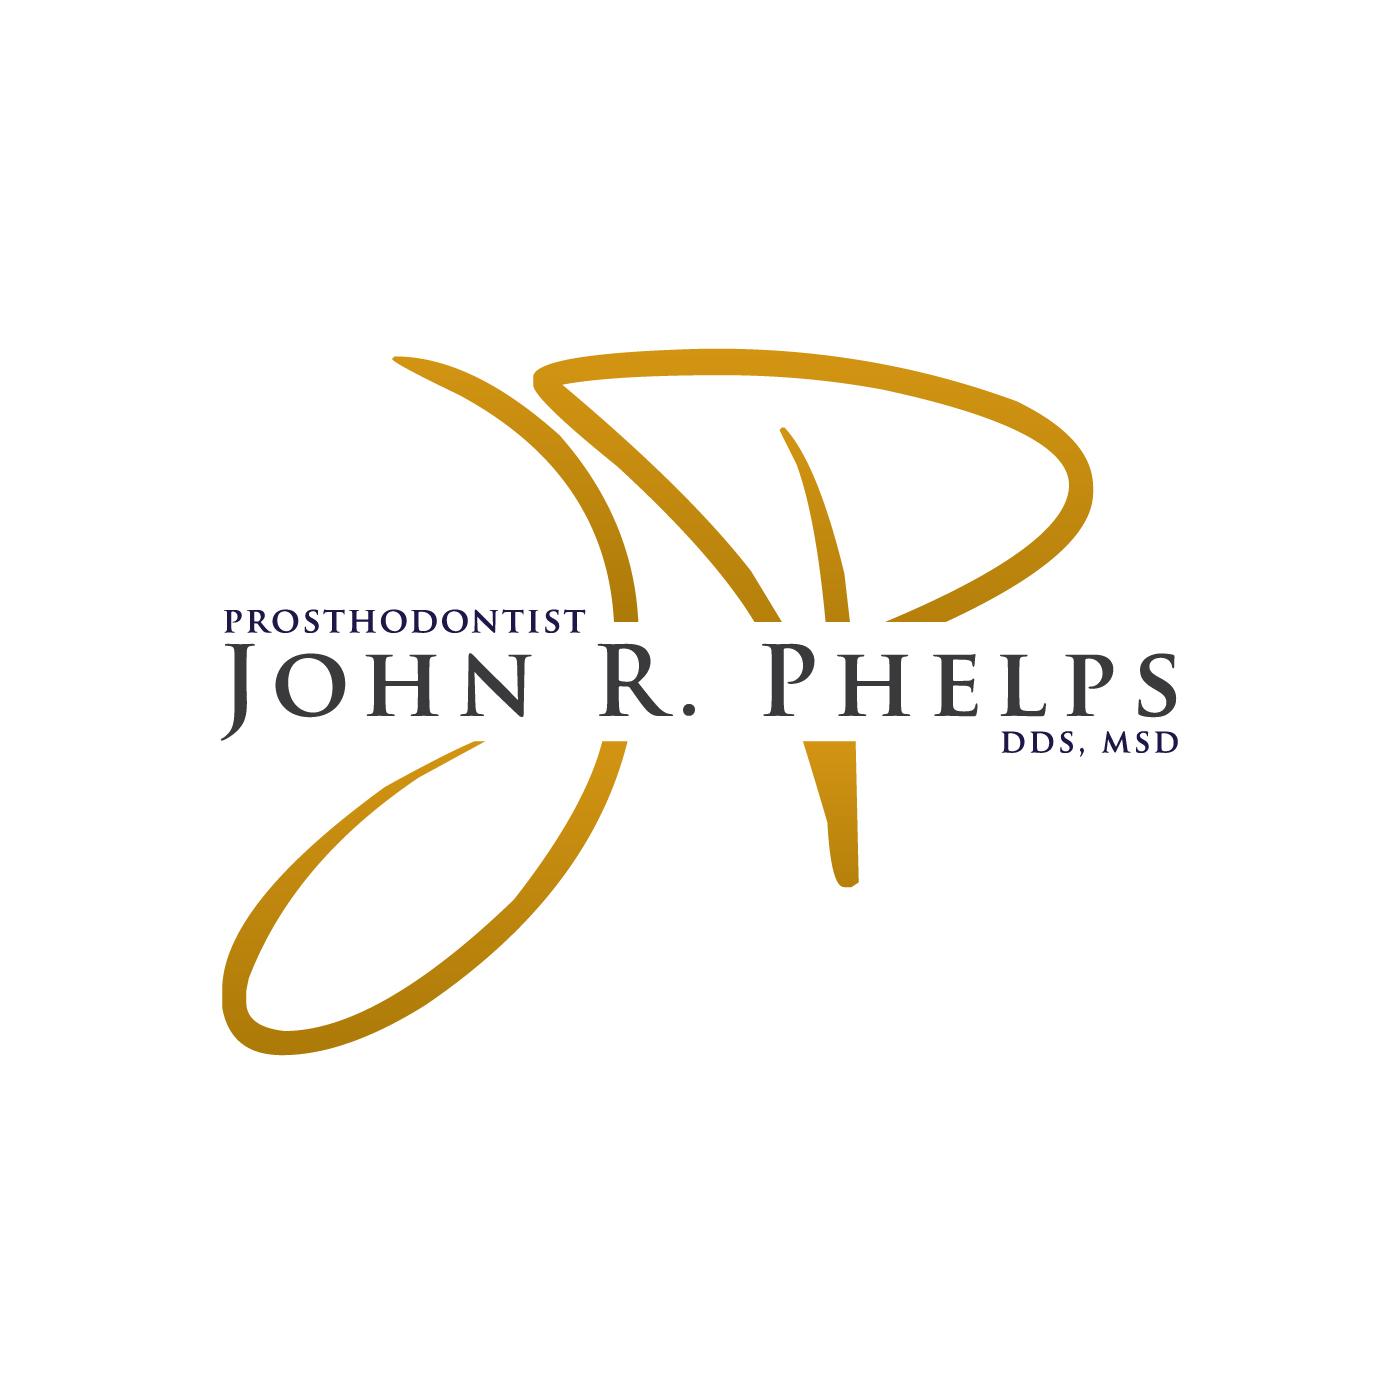 John R. Phelps, DDS MSD